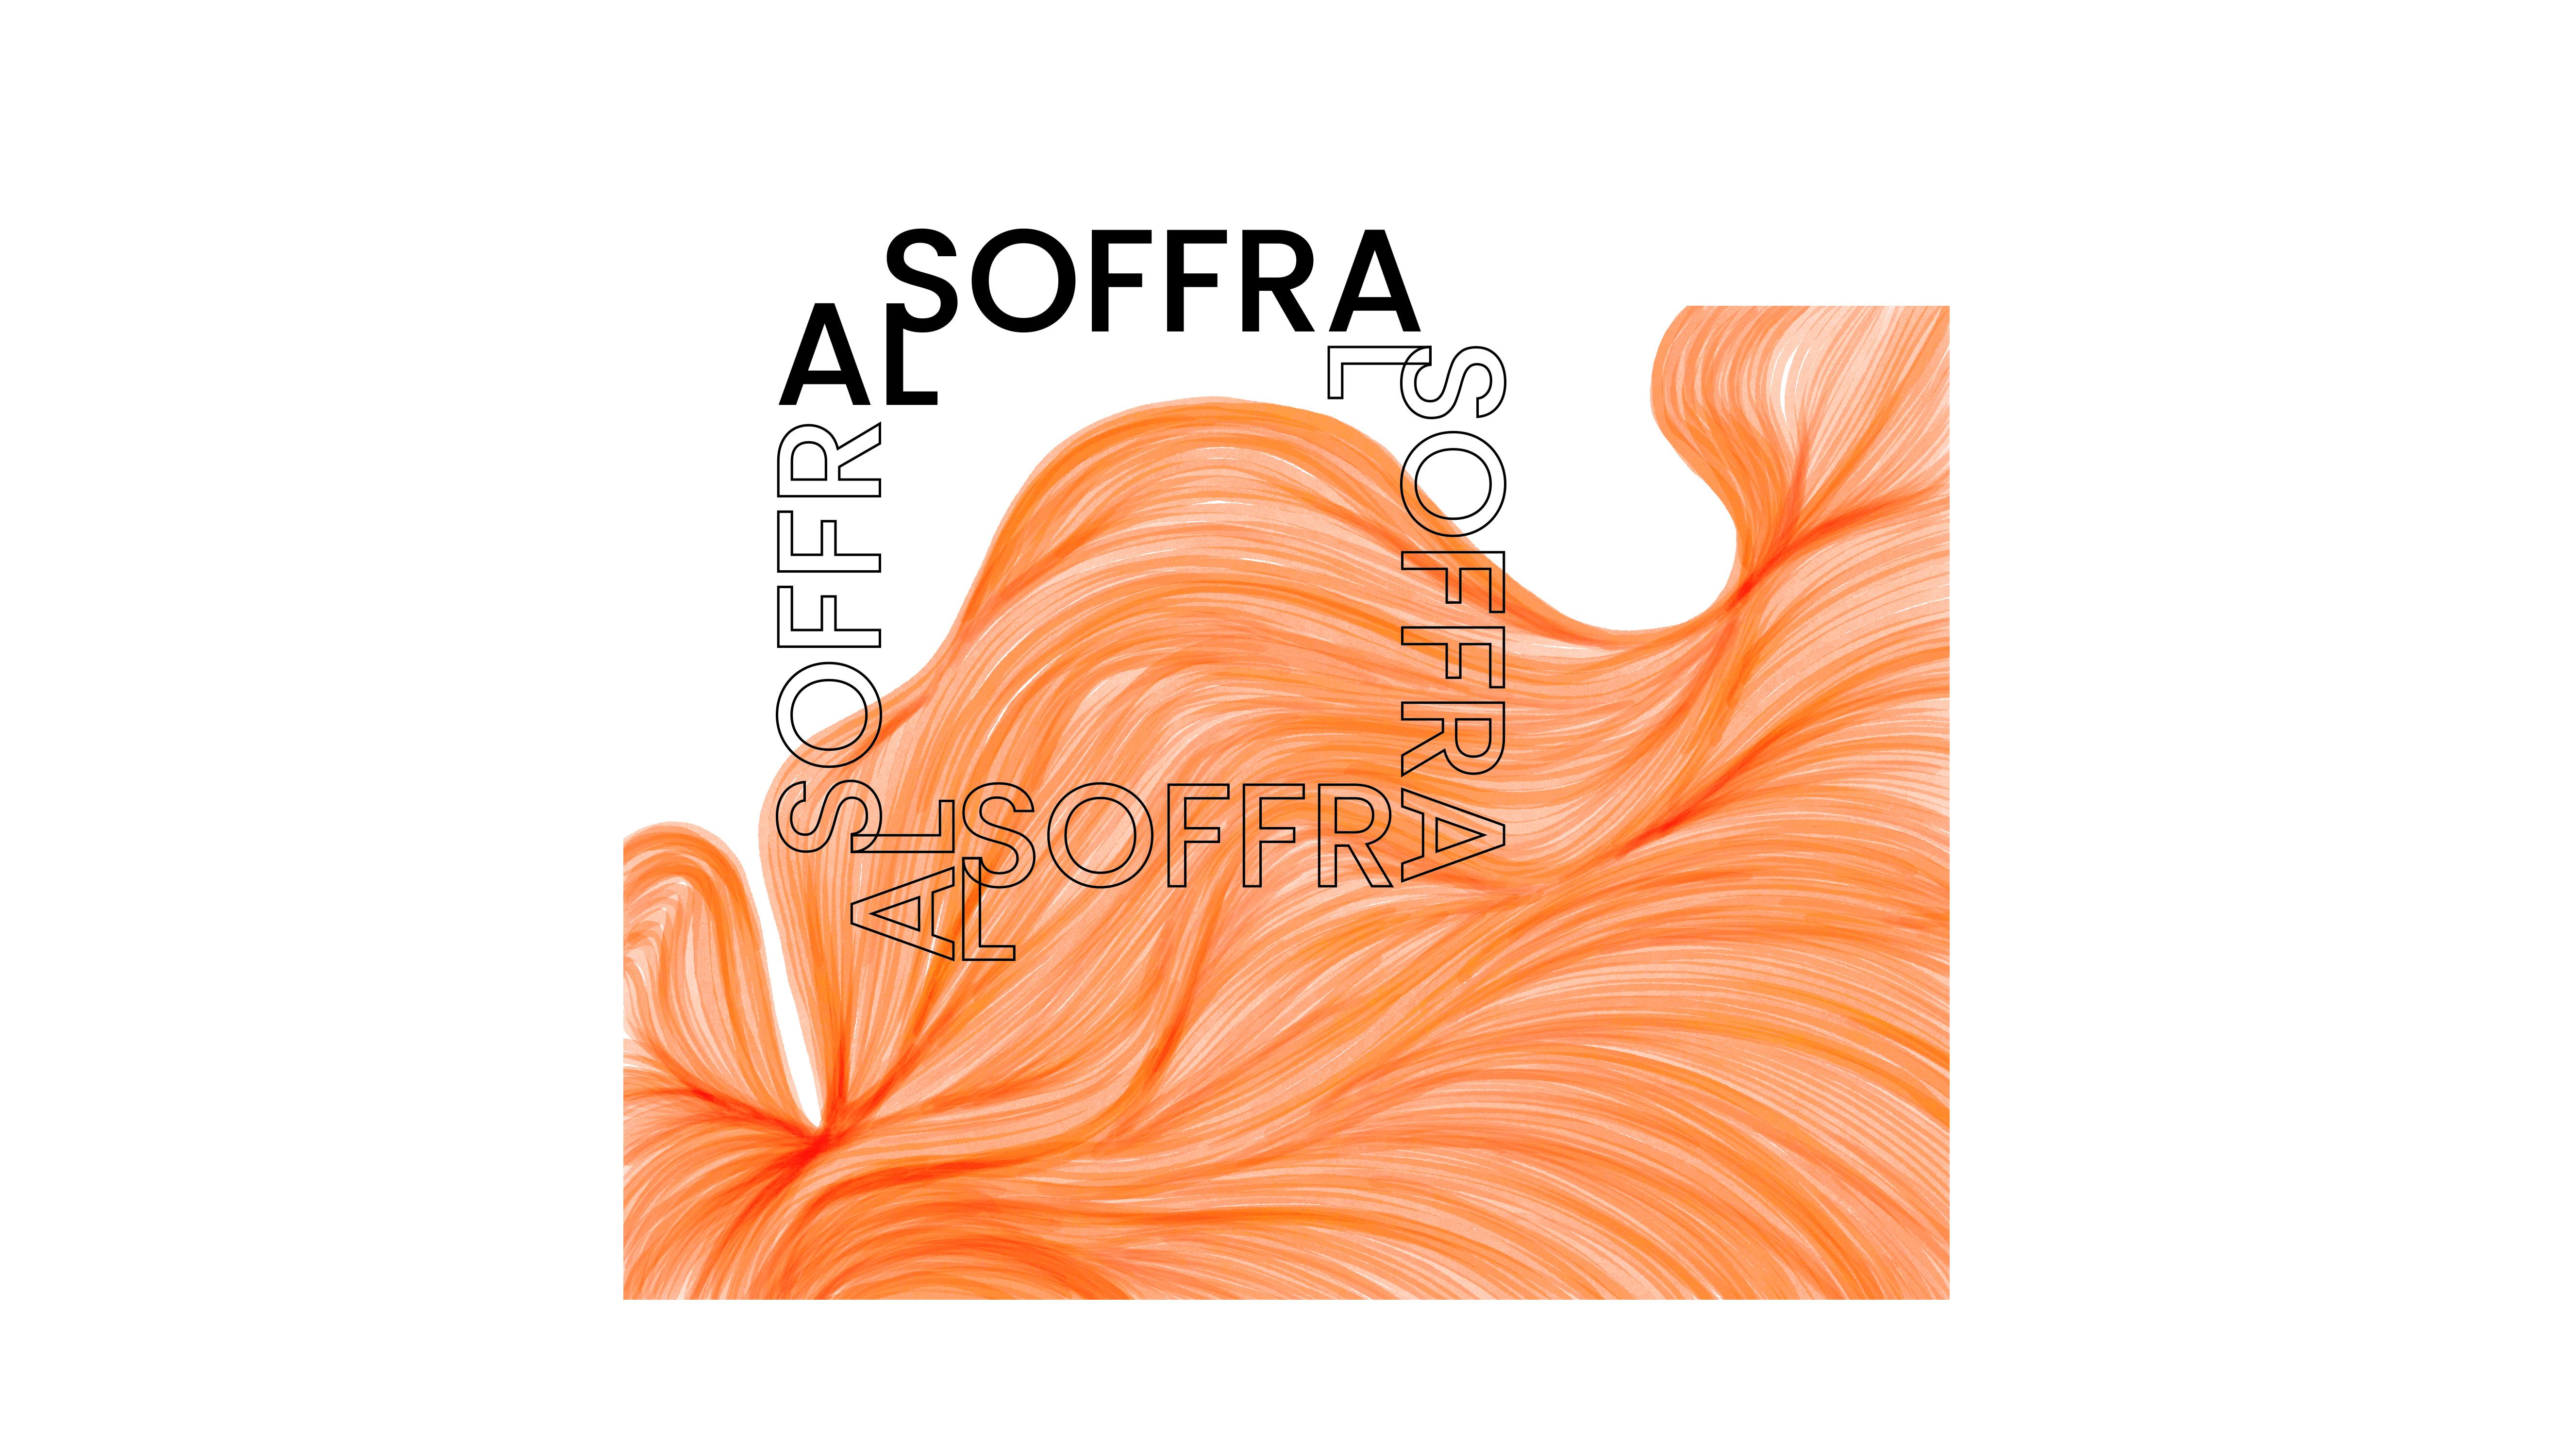 AlSoffra-Bourroullec_3